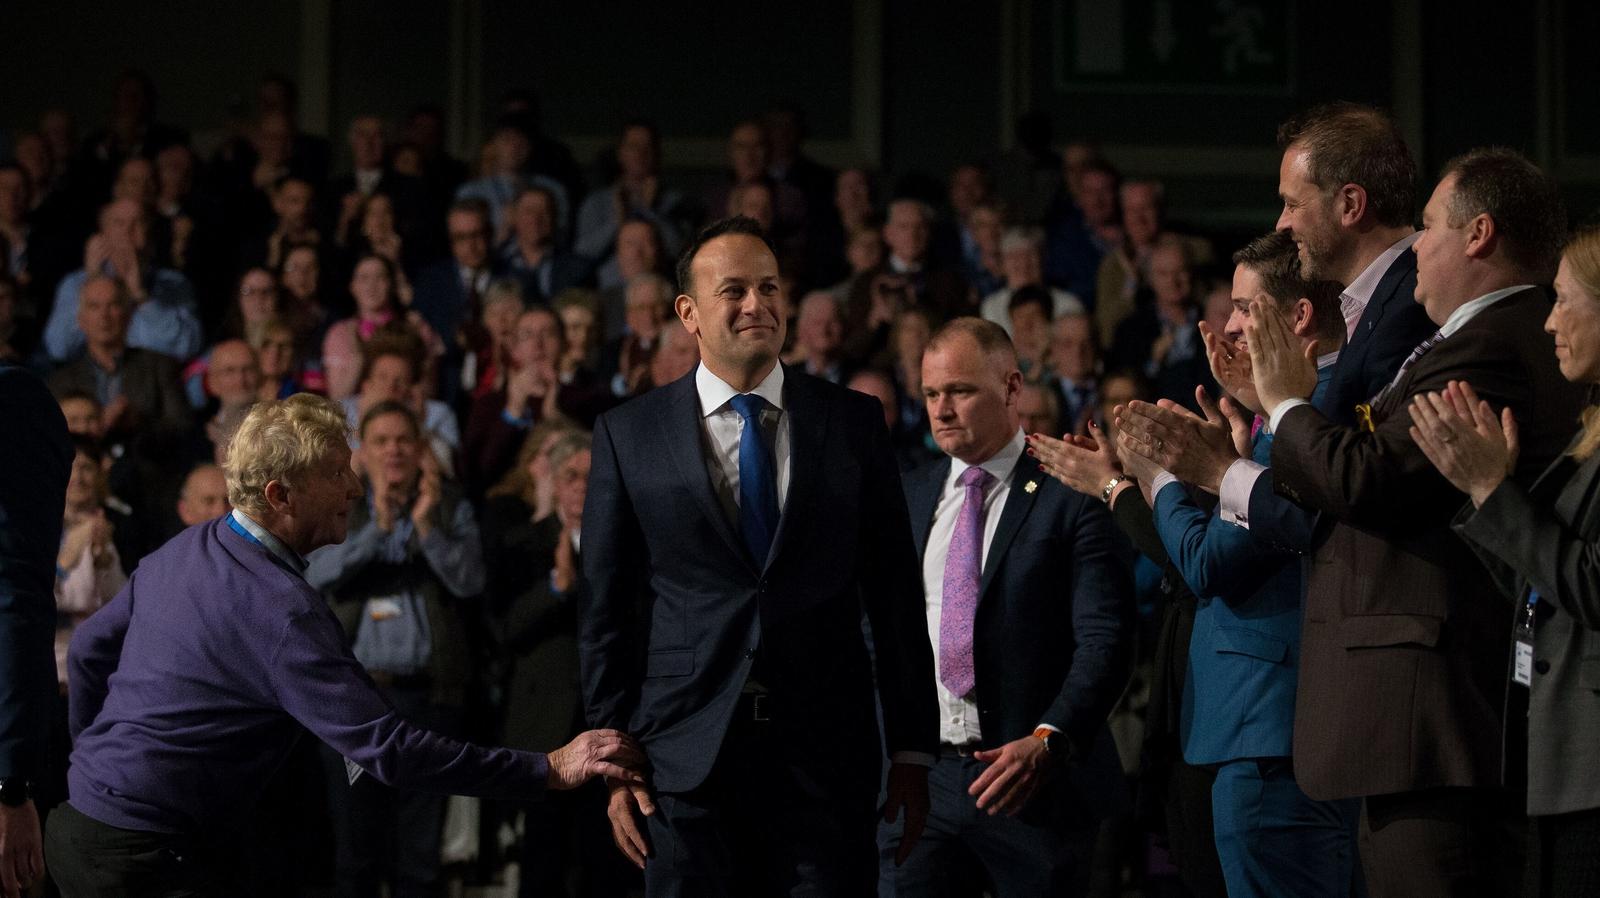 Image - The Fine Gael Ard Fheis in November 2018